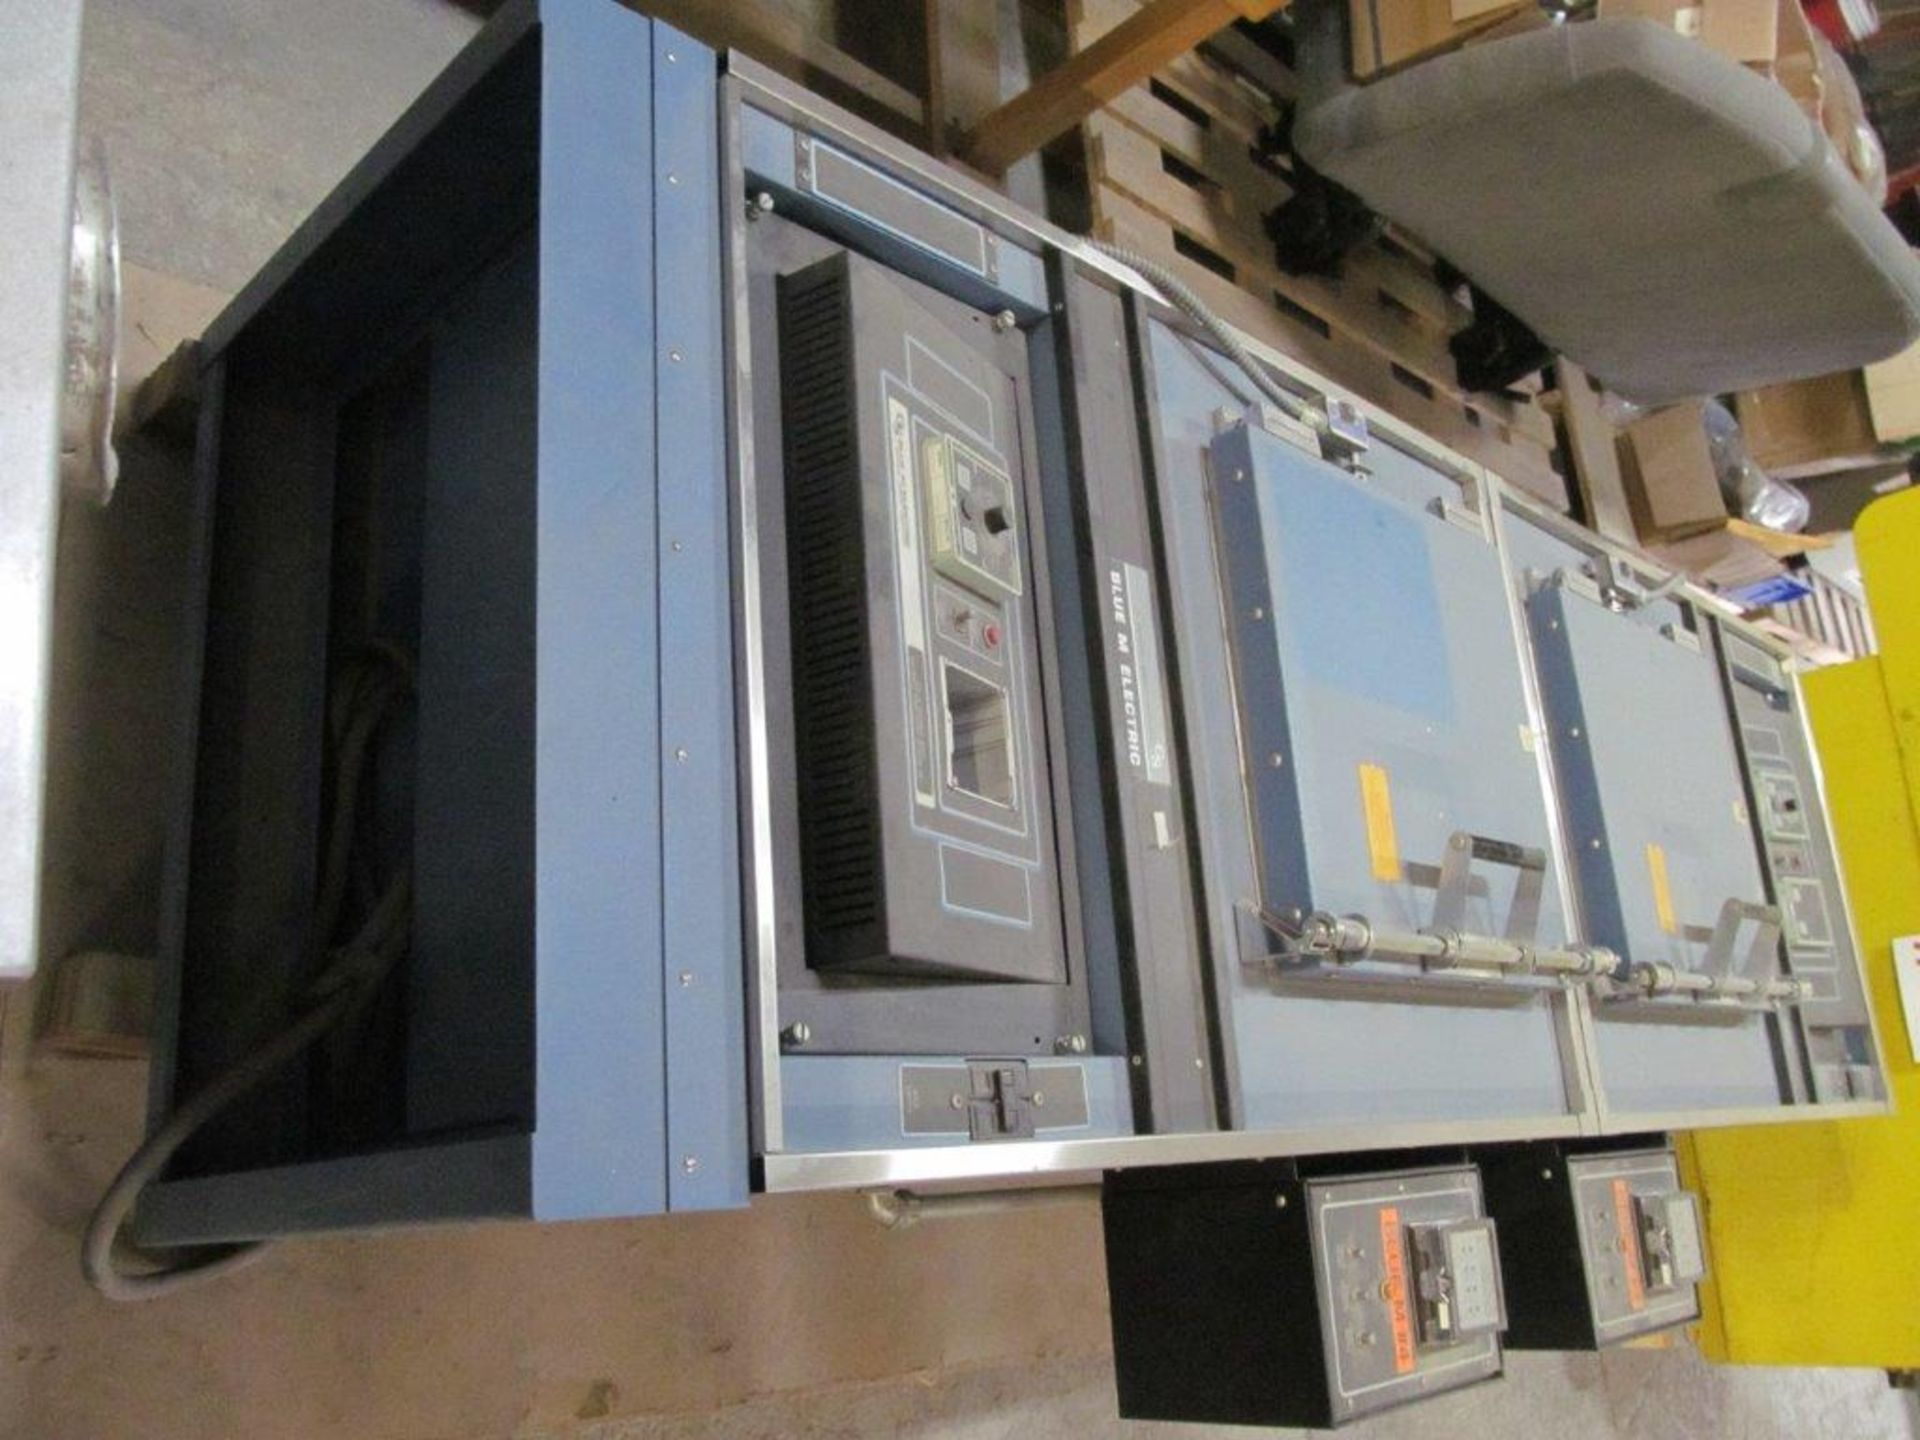 BLUE ELECTRIC 2 Chamber 100deg F. to 700deg F. - LOCATION - HAWKESBURY, ONTARIO - Image 2 of 8